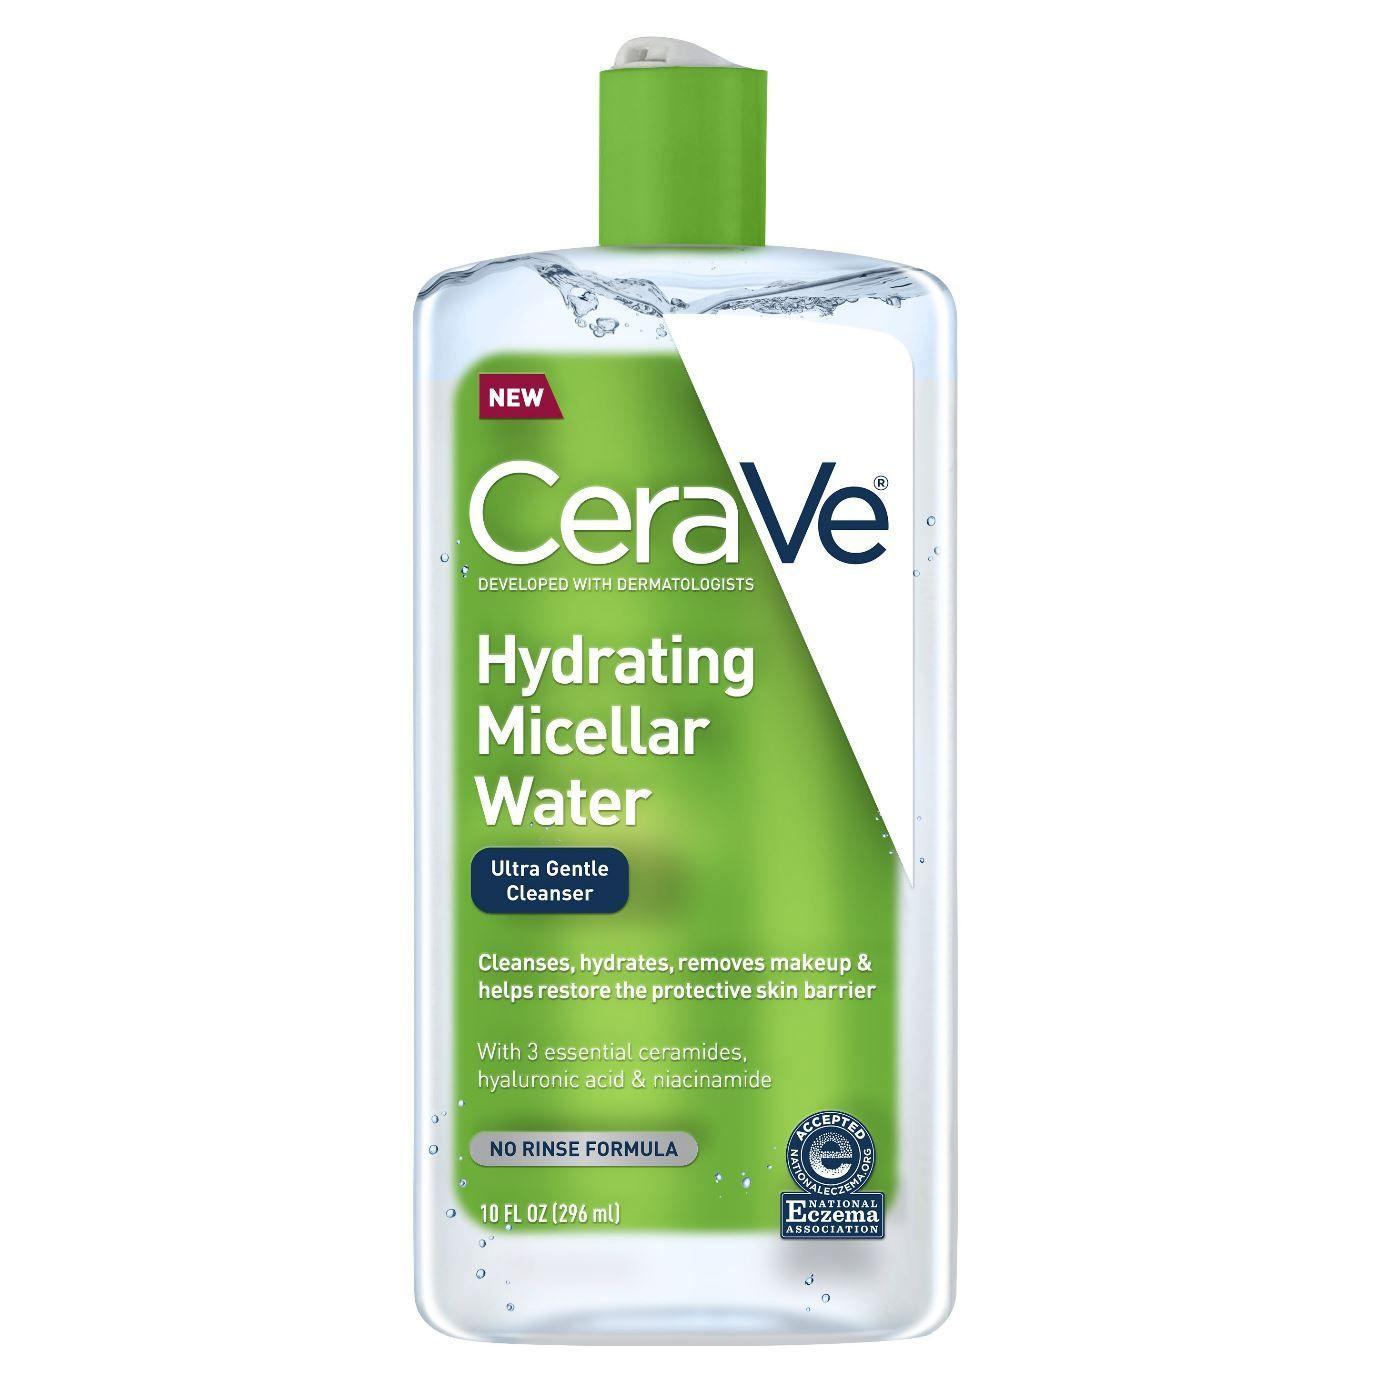 Hydrating Micellar Water